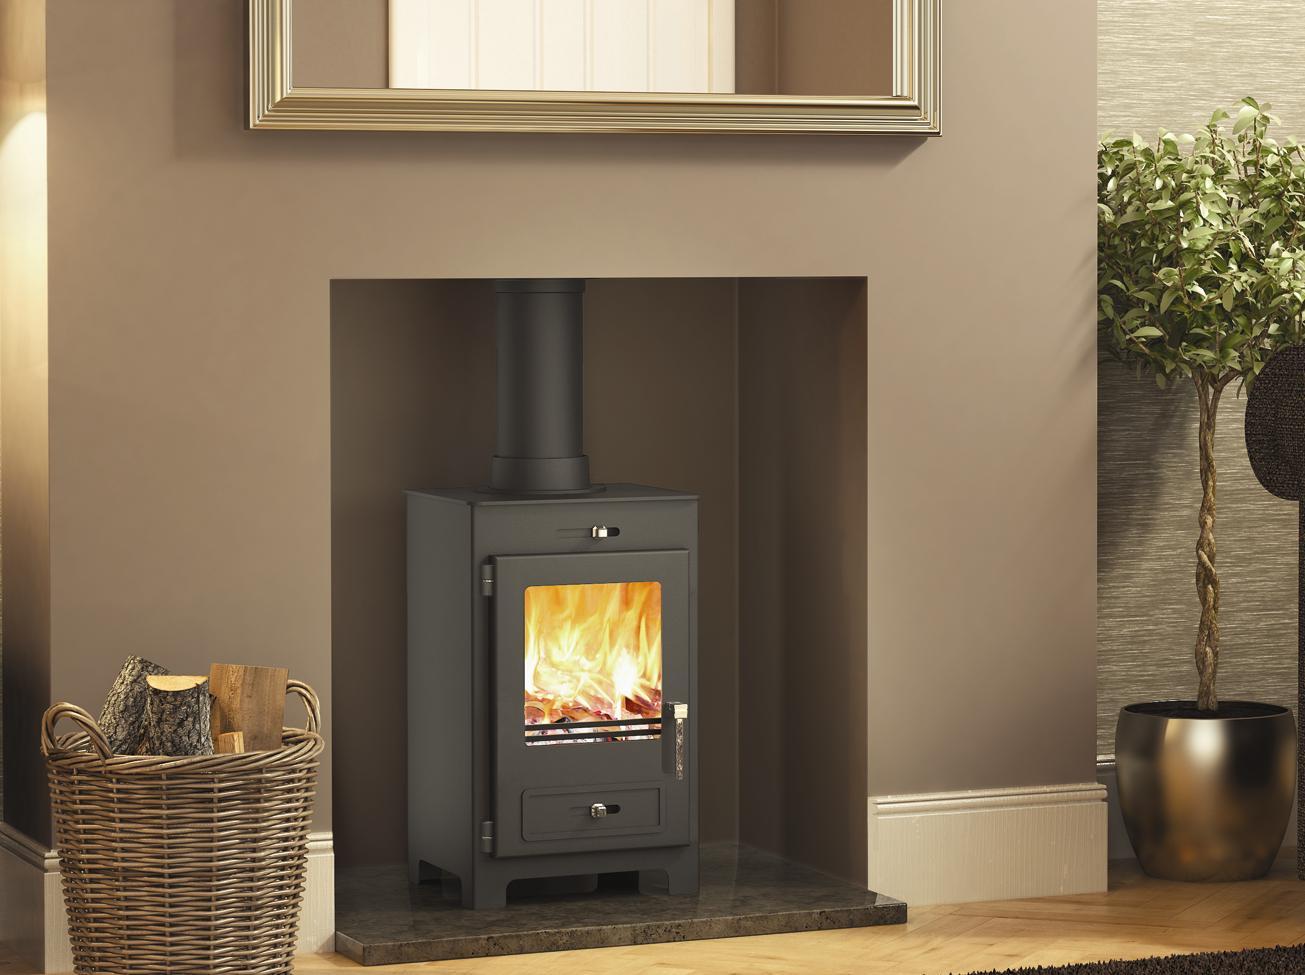 wood burner stove pic